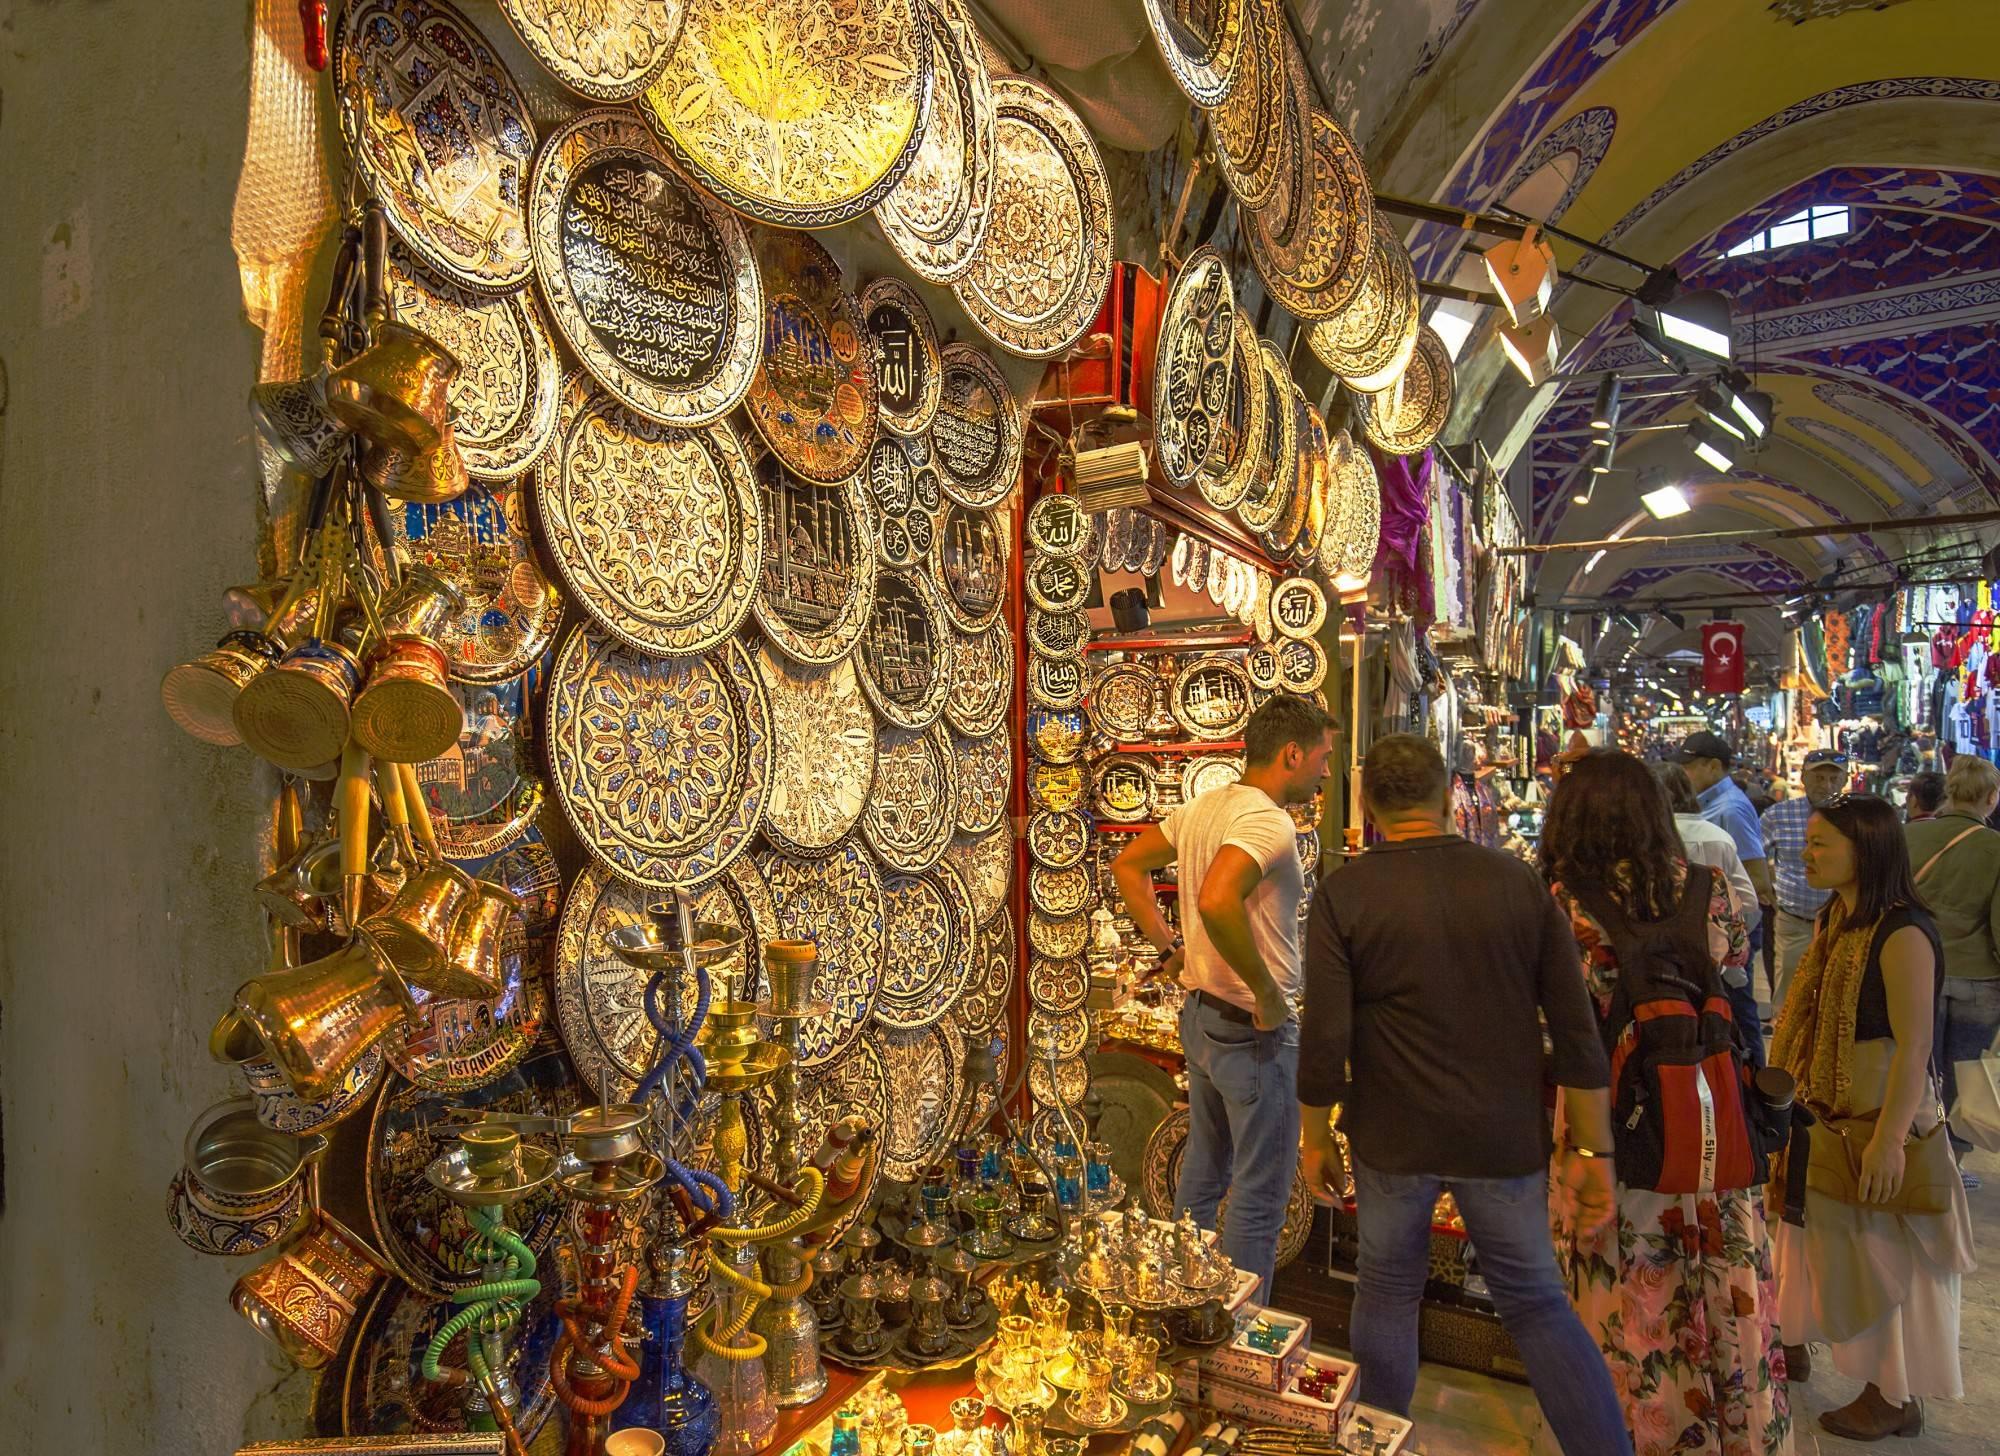 Гранд-базар:путеводитель по стамбулу